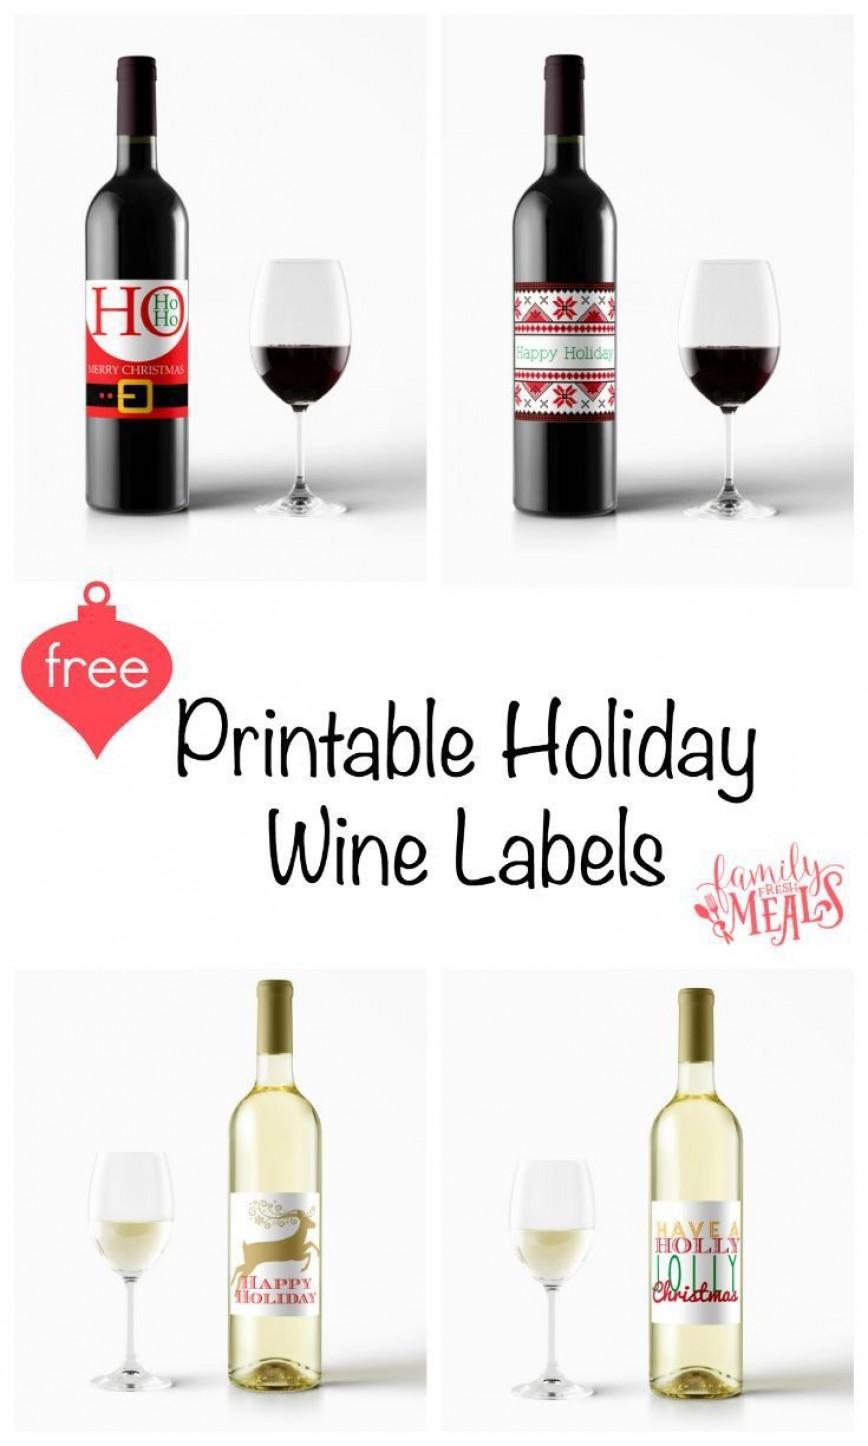 001 Singular Free Wine Label Template Design  Bottle Microsoft Word Online Psd868